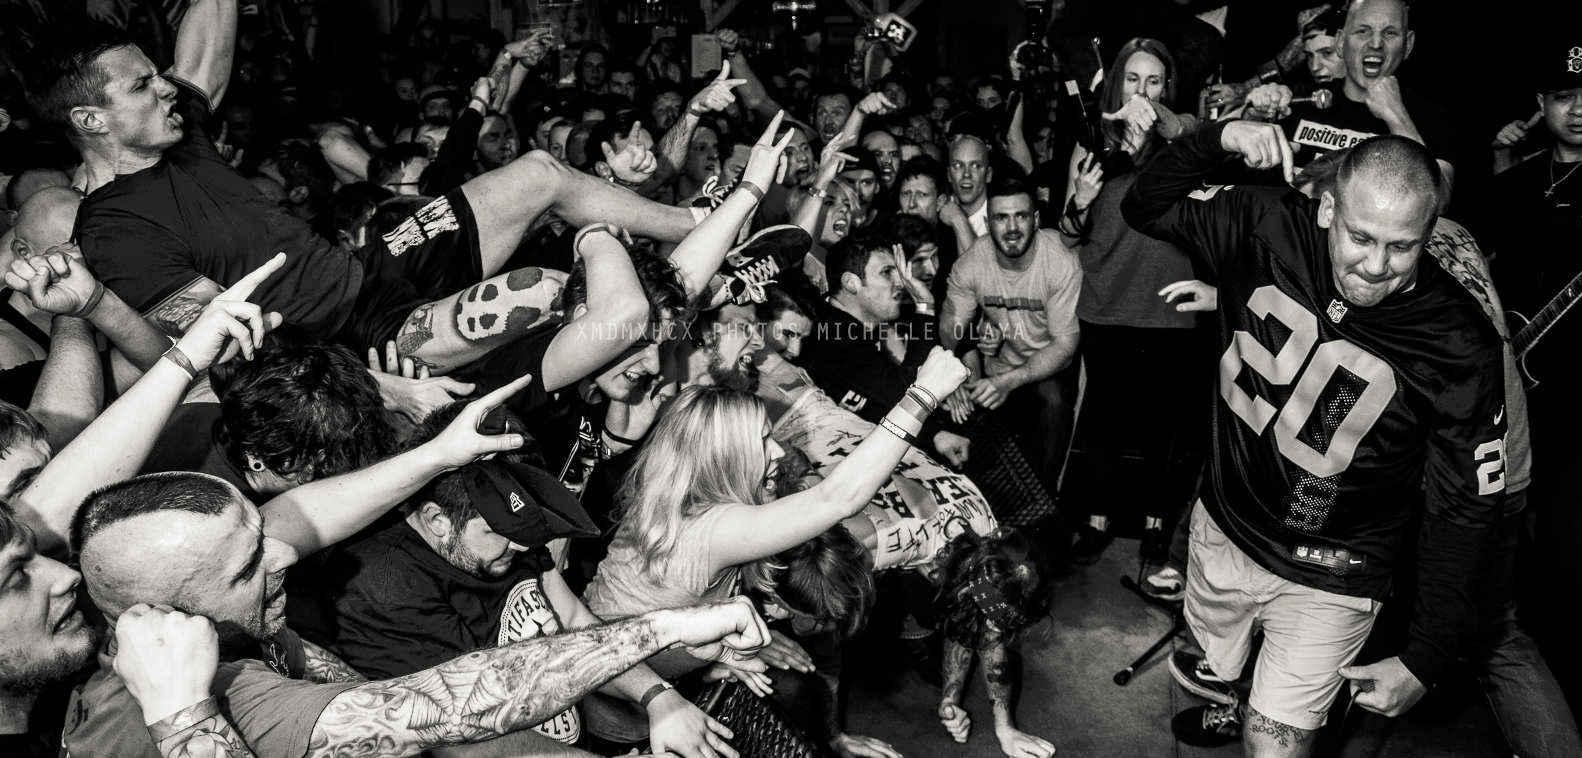 Terror-Nick-Jett-Tour-Hardcore.jpg